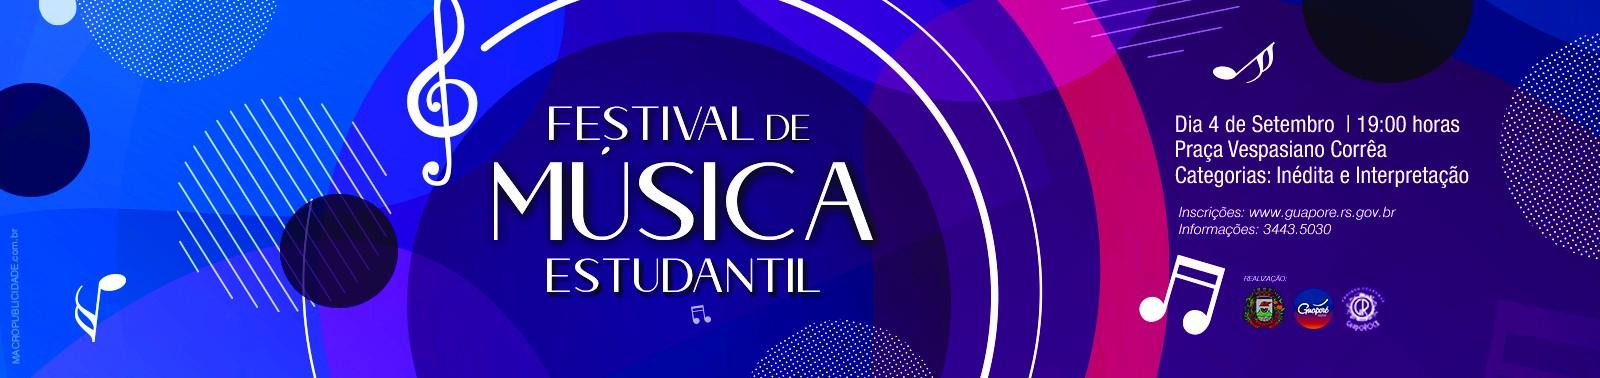 Banner 3 - Festival de Música Estudantil